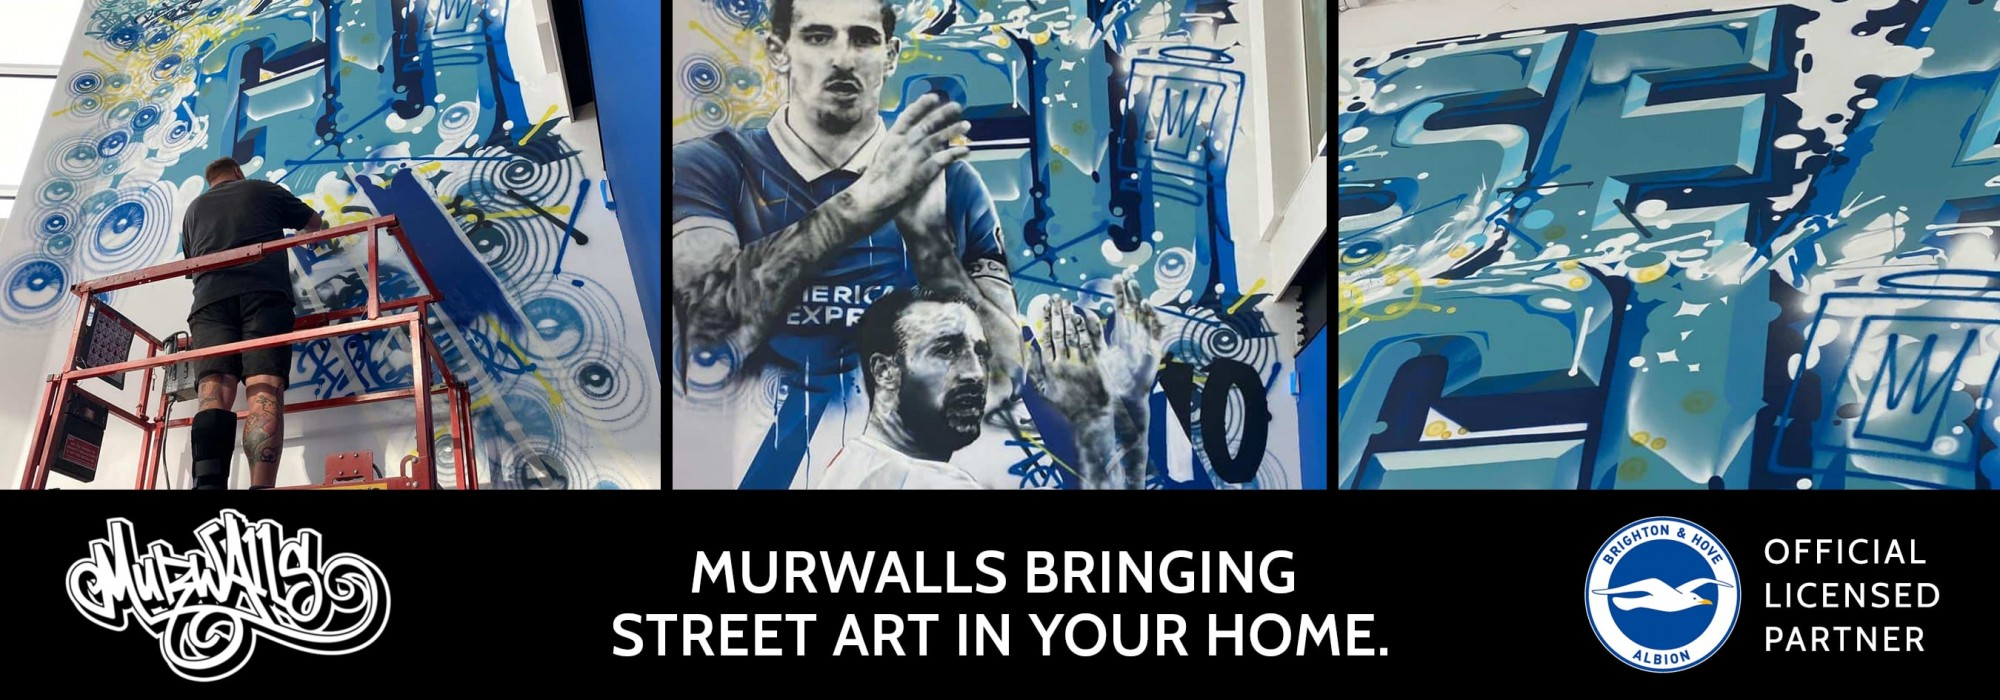 Murwalls - Official Licensed Partner